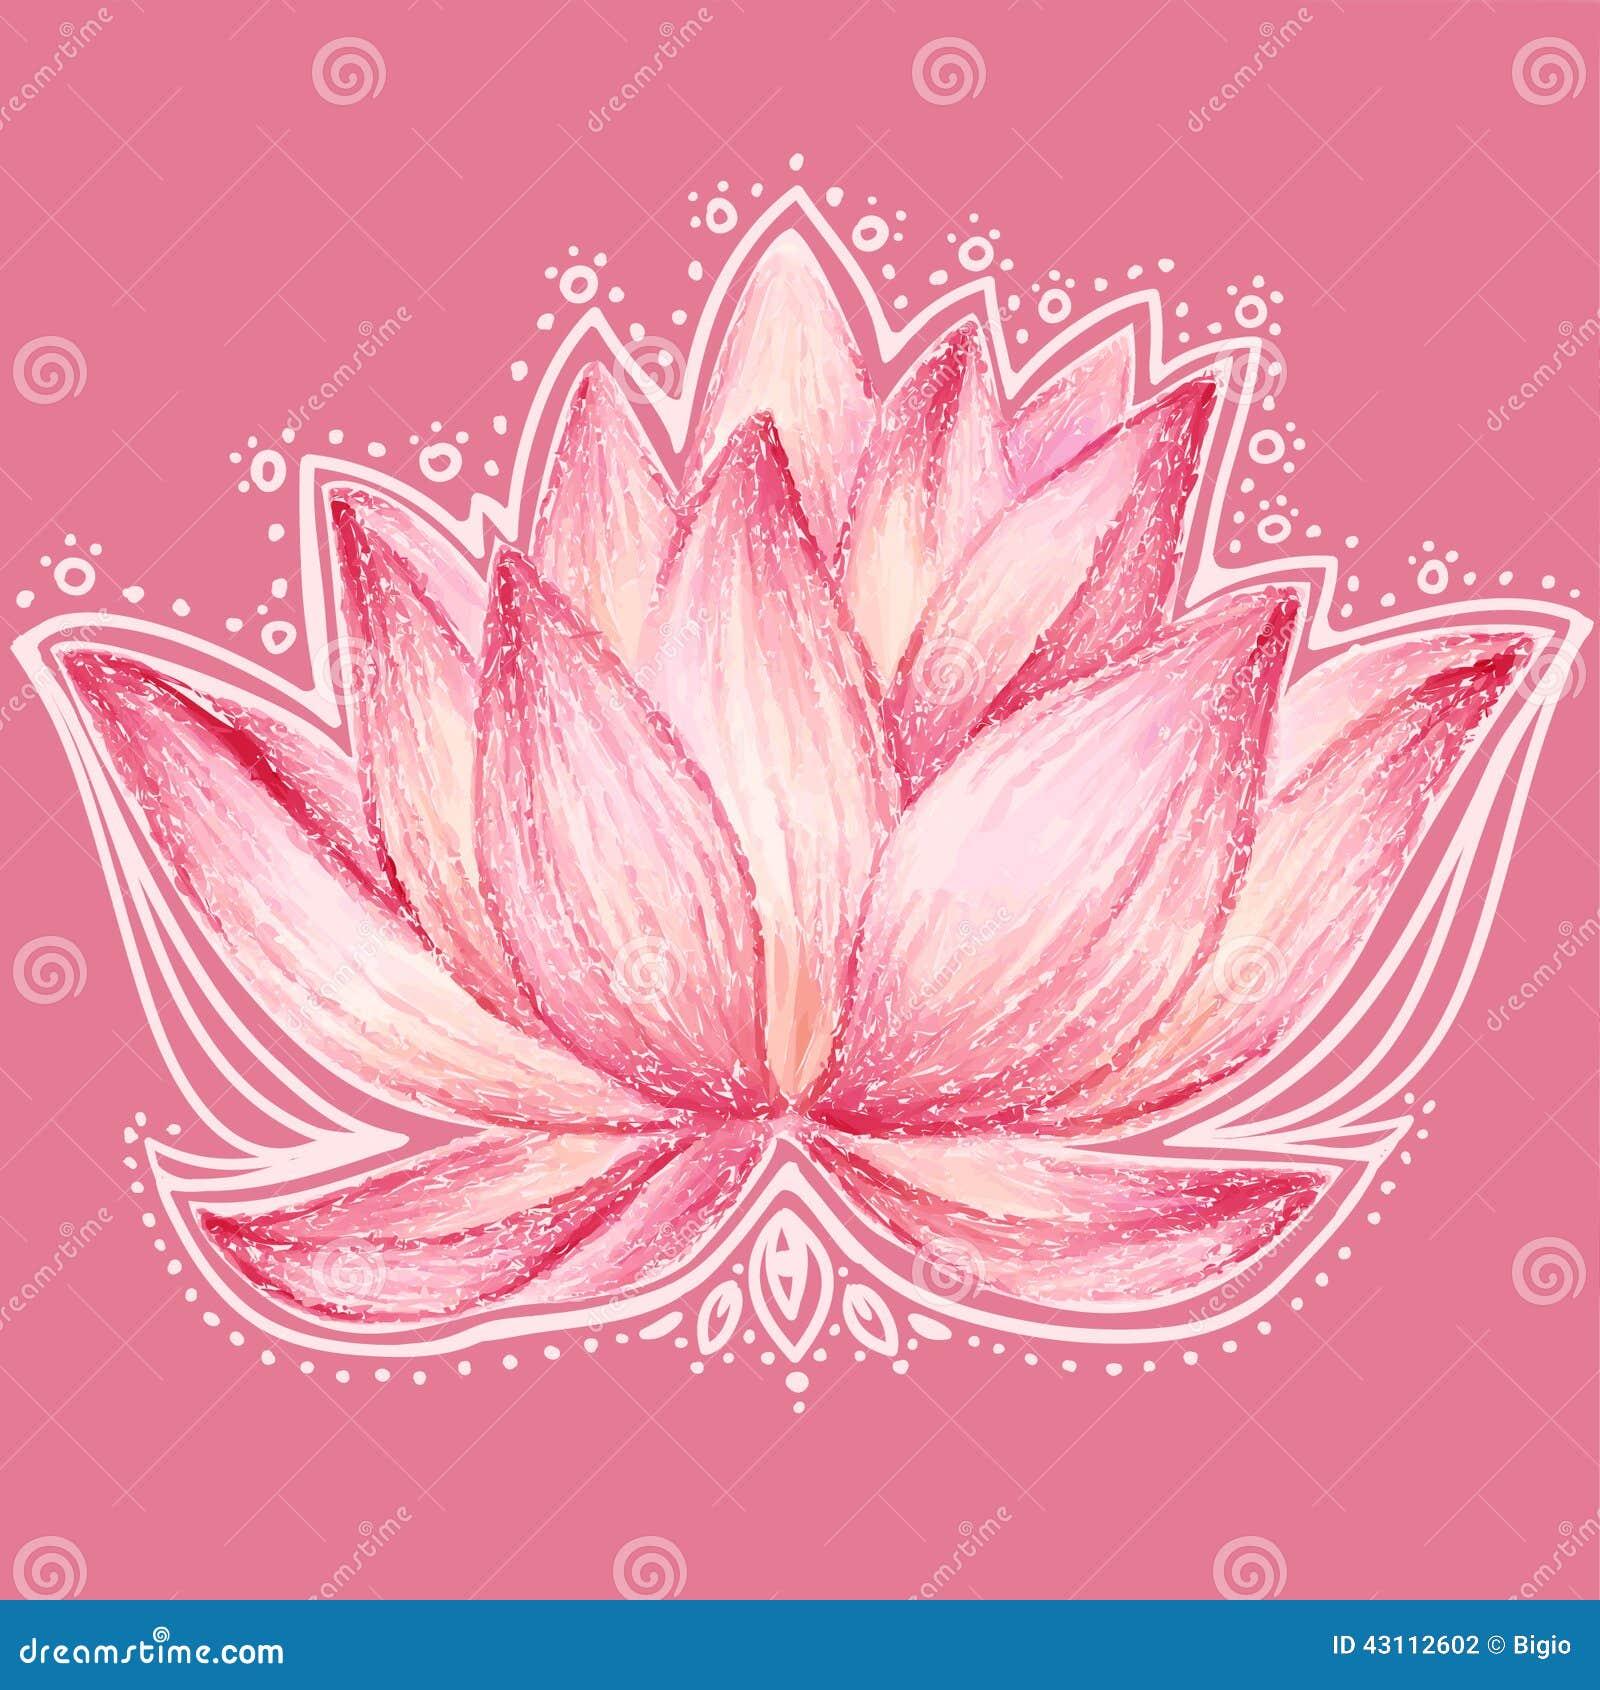 Lotus flower design stock vector illustration of invitation 43112602 lotus flower design izmirmasajfo